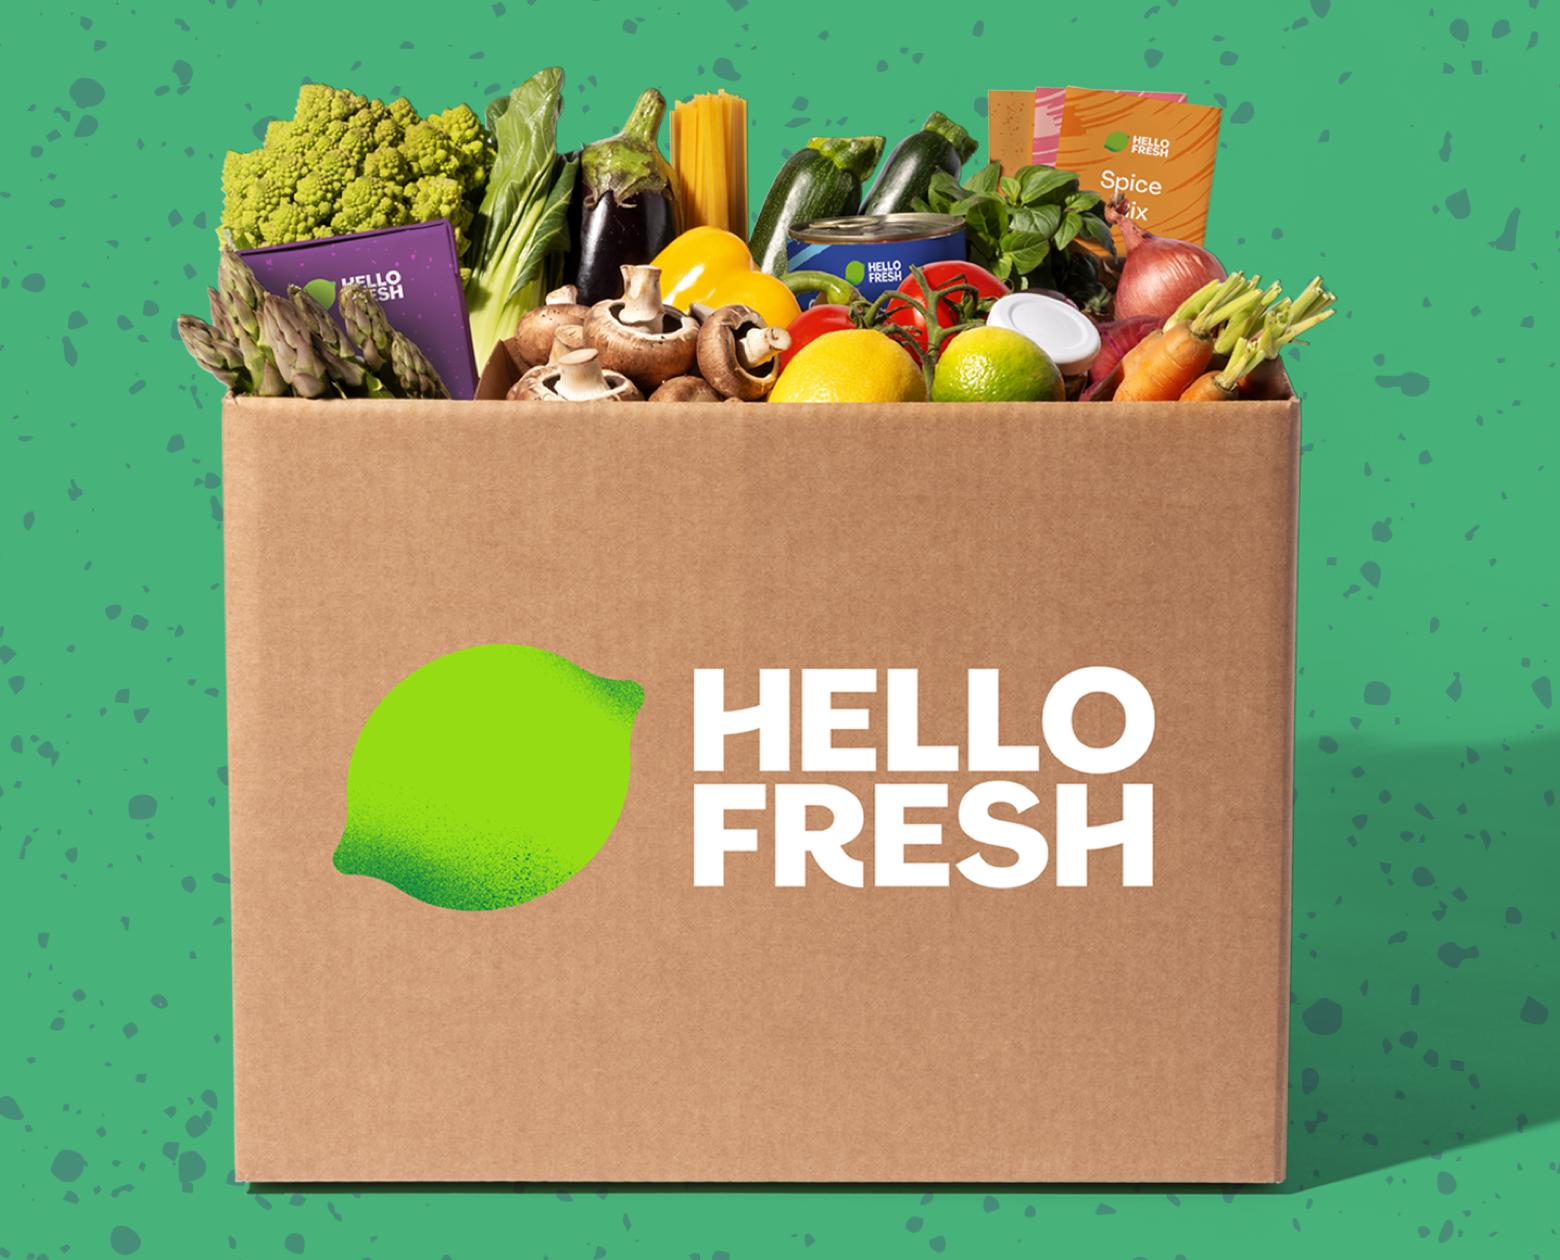 a hello fresh box with food insid